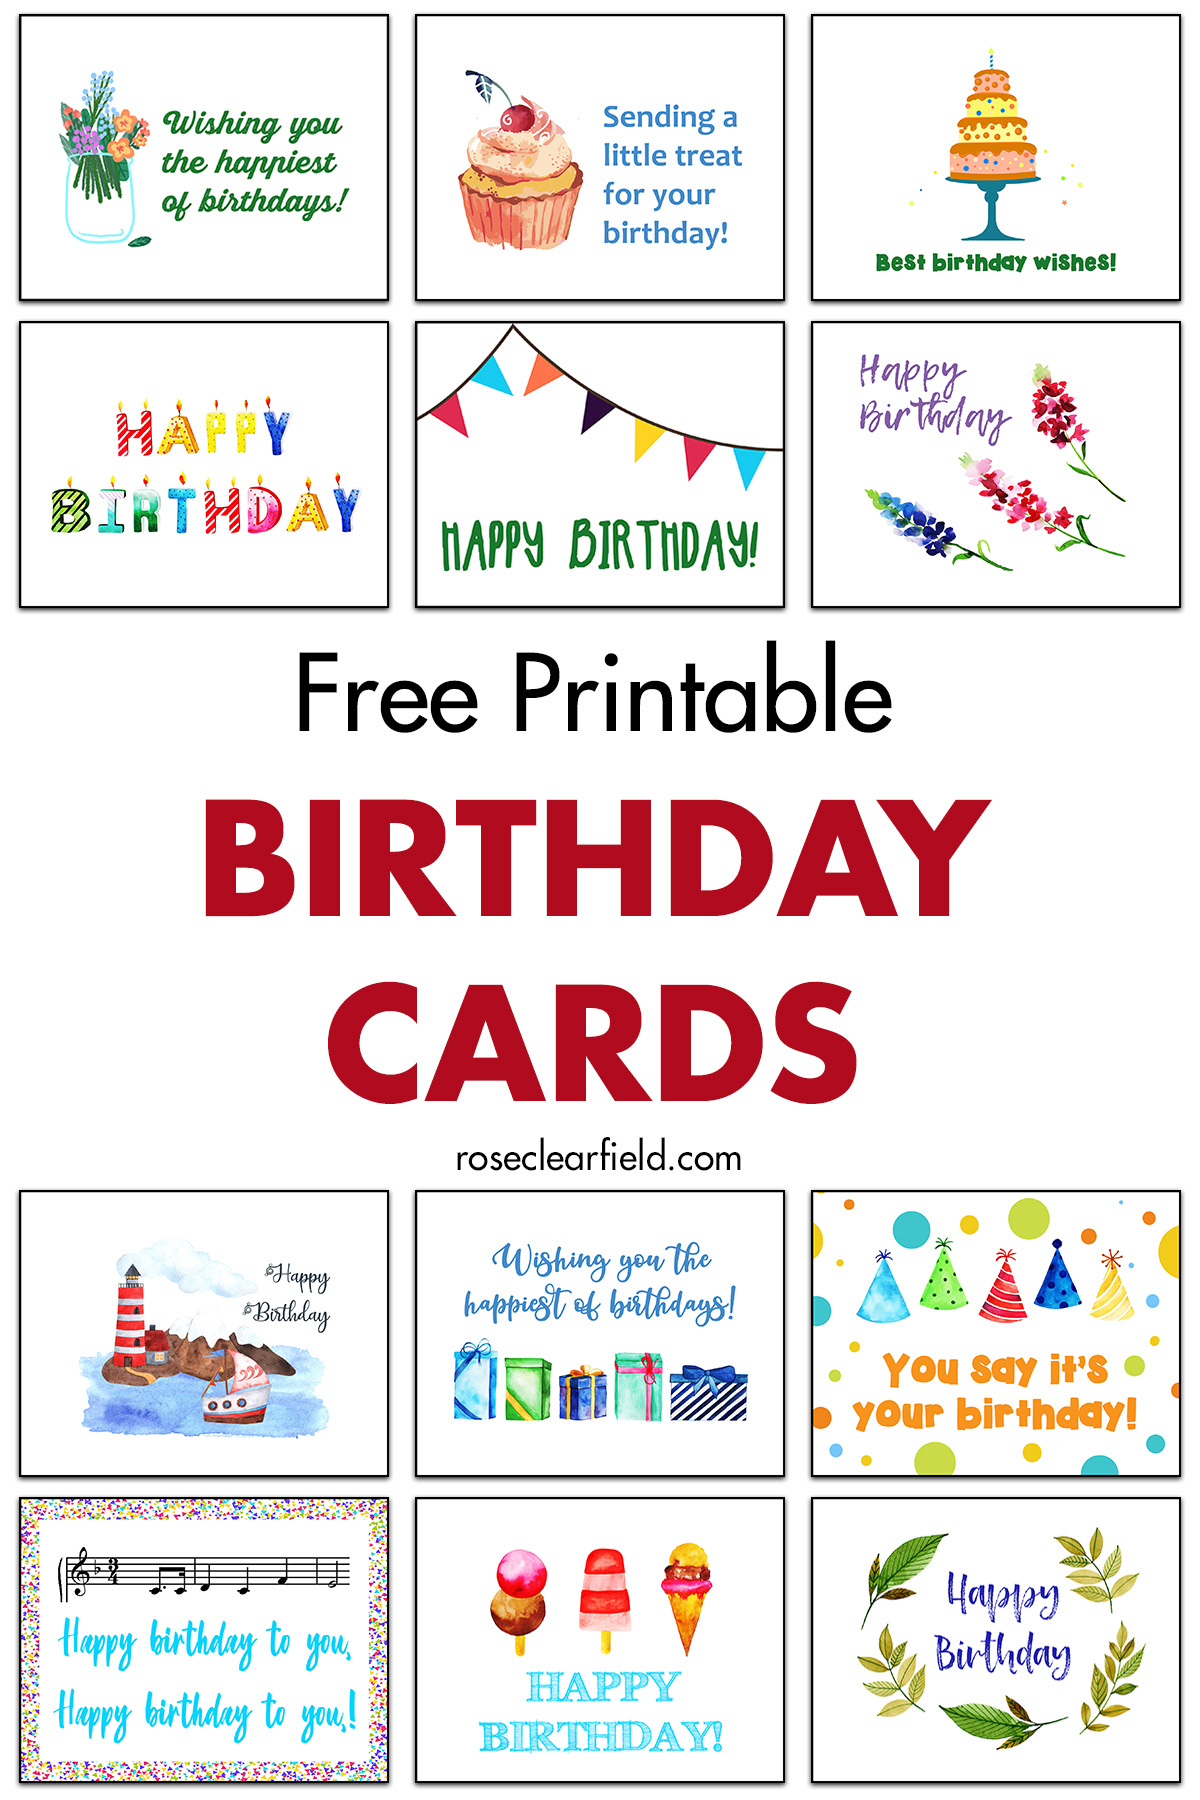 Printable Birthday Cards For Son : printable, birthday, cards, Printable, Birthday, Cards, Clearfield